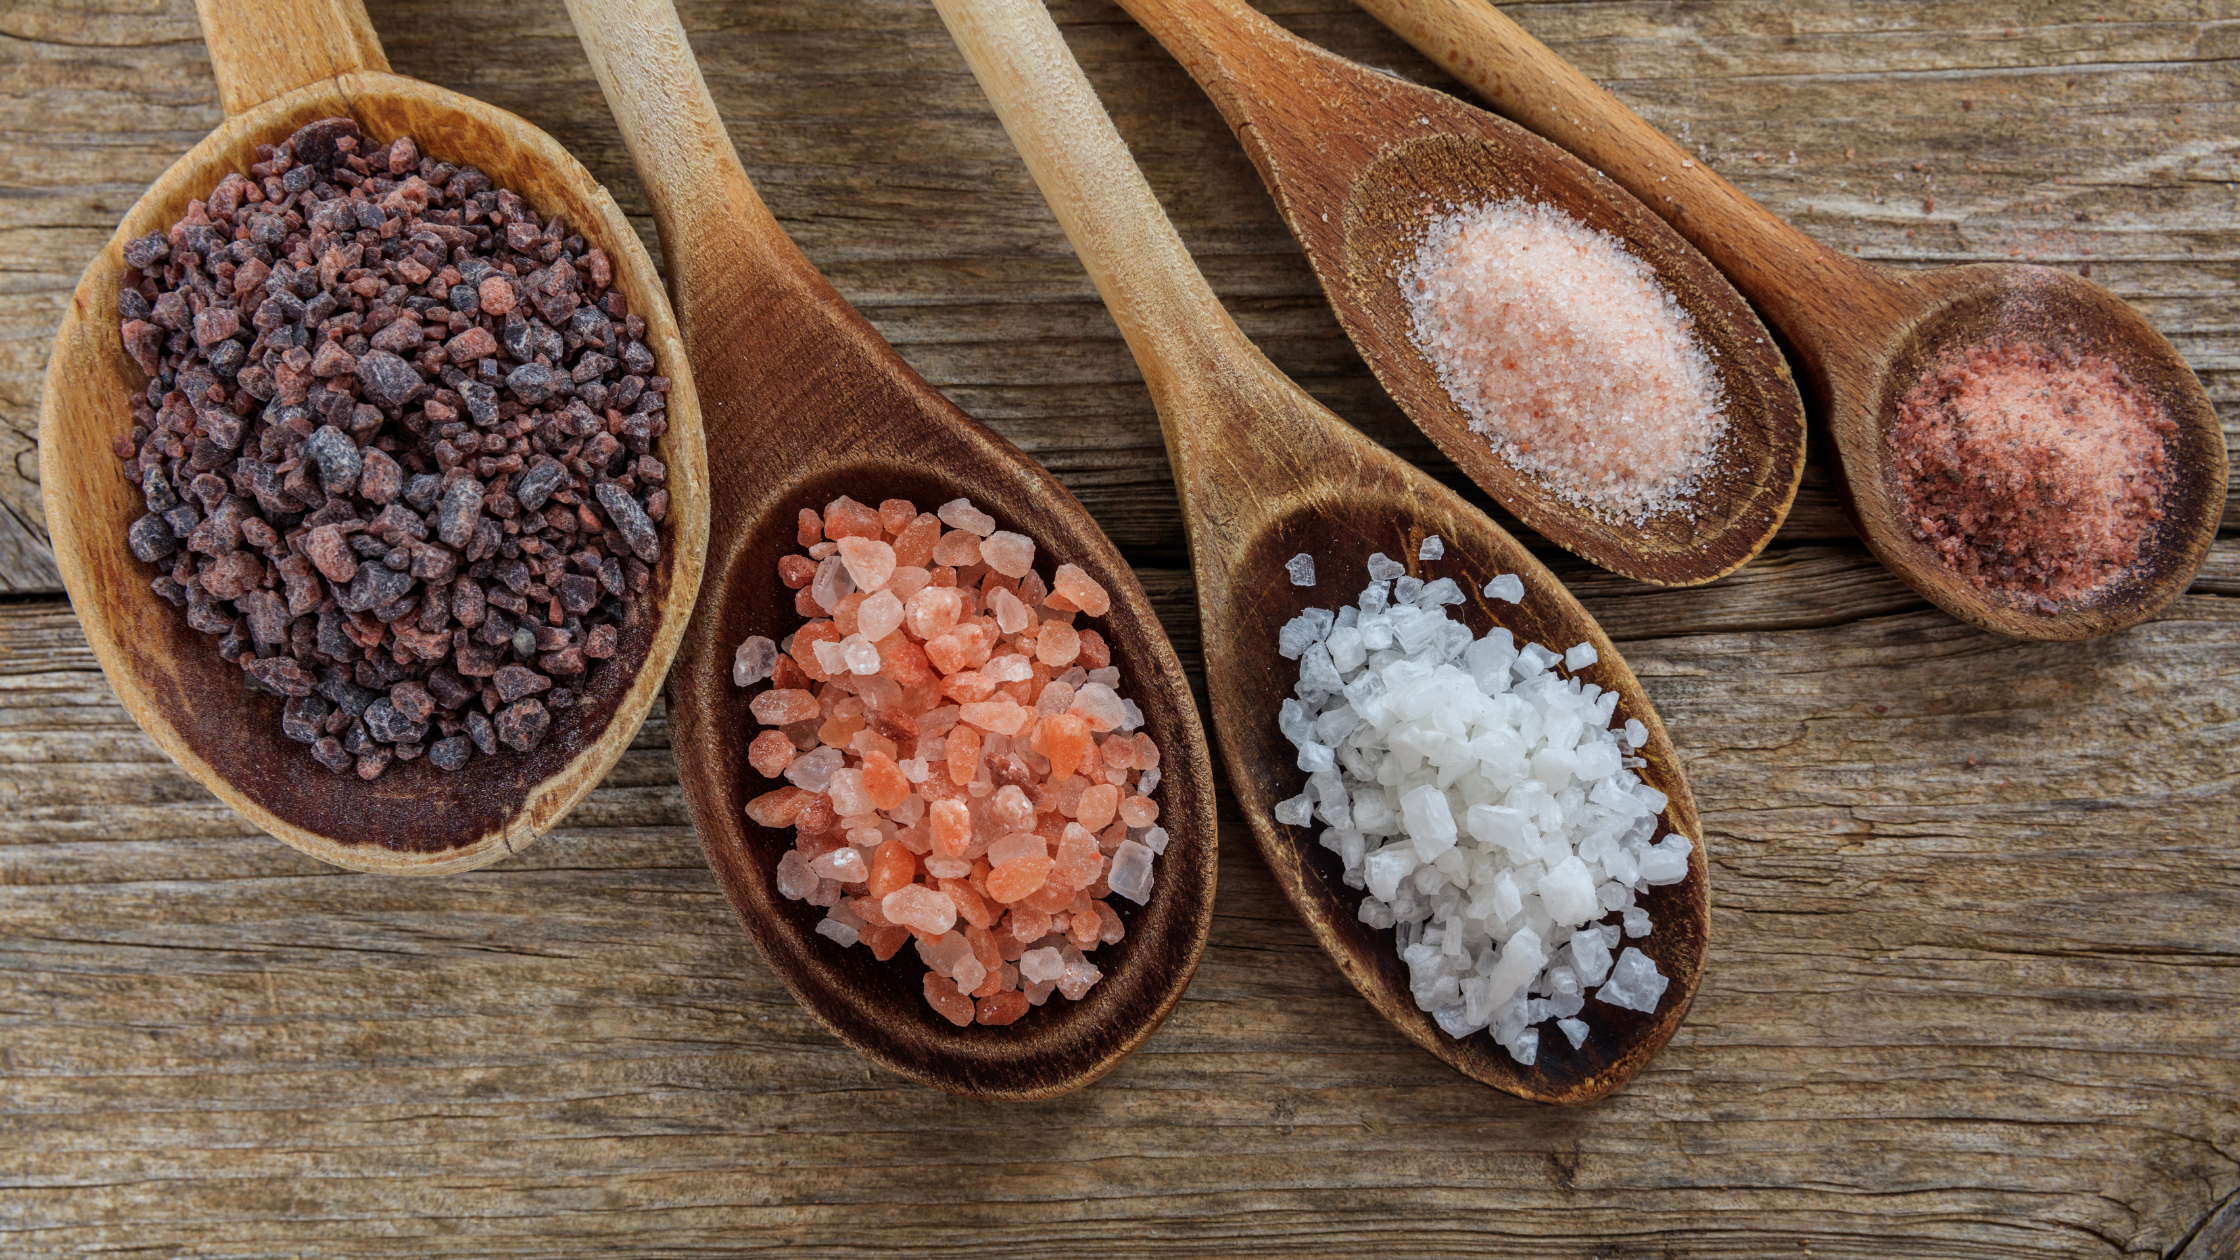 SALT: Helpful tips for how to best use salt